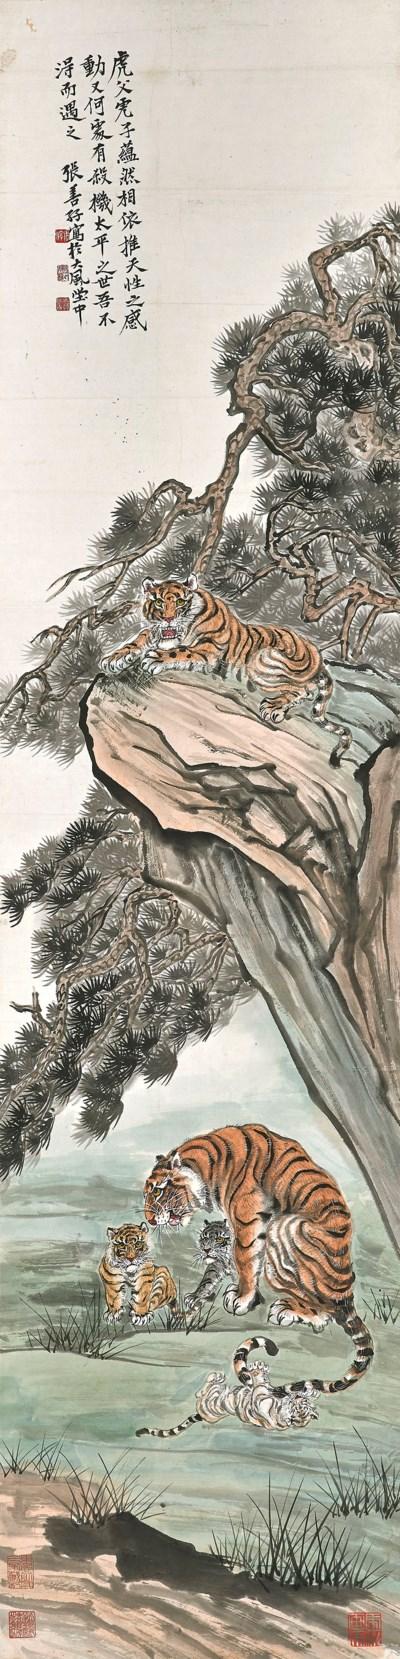 ZHANG SHANZI (1882-1940)